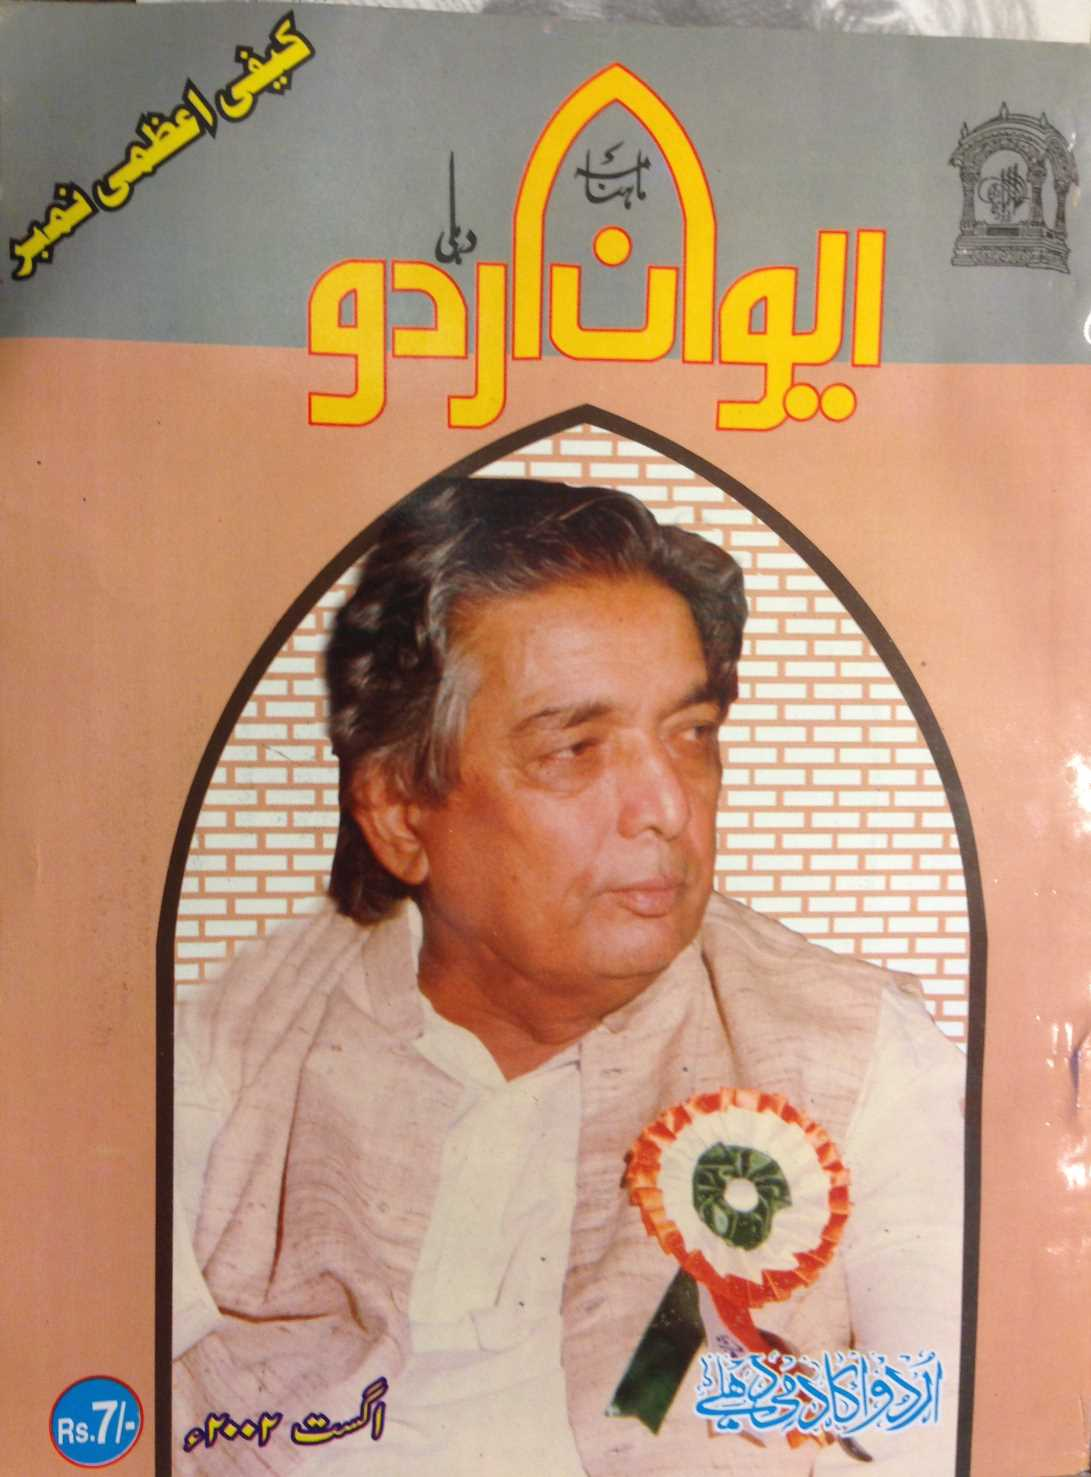 Aiwan-e-Urdu - Kaifi Azmi